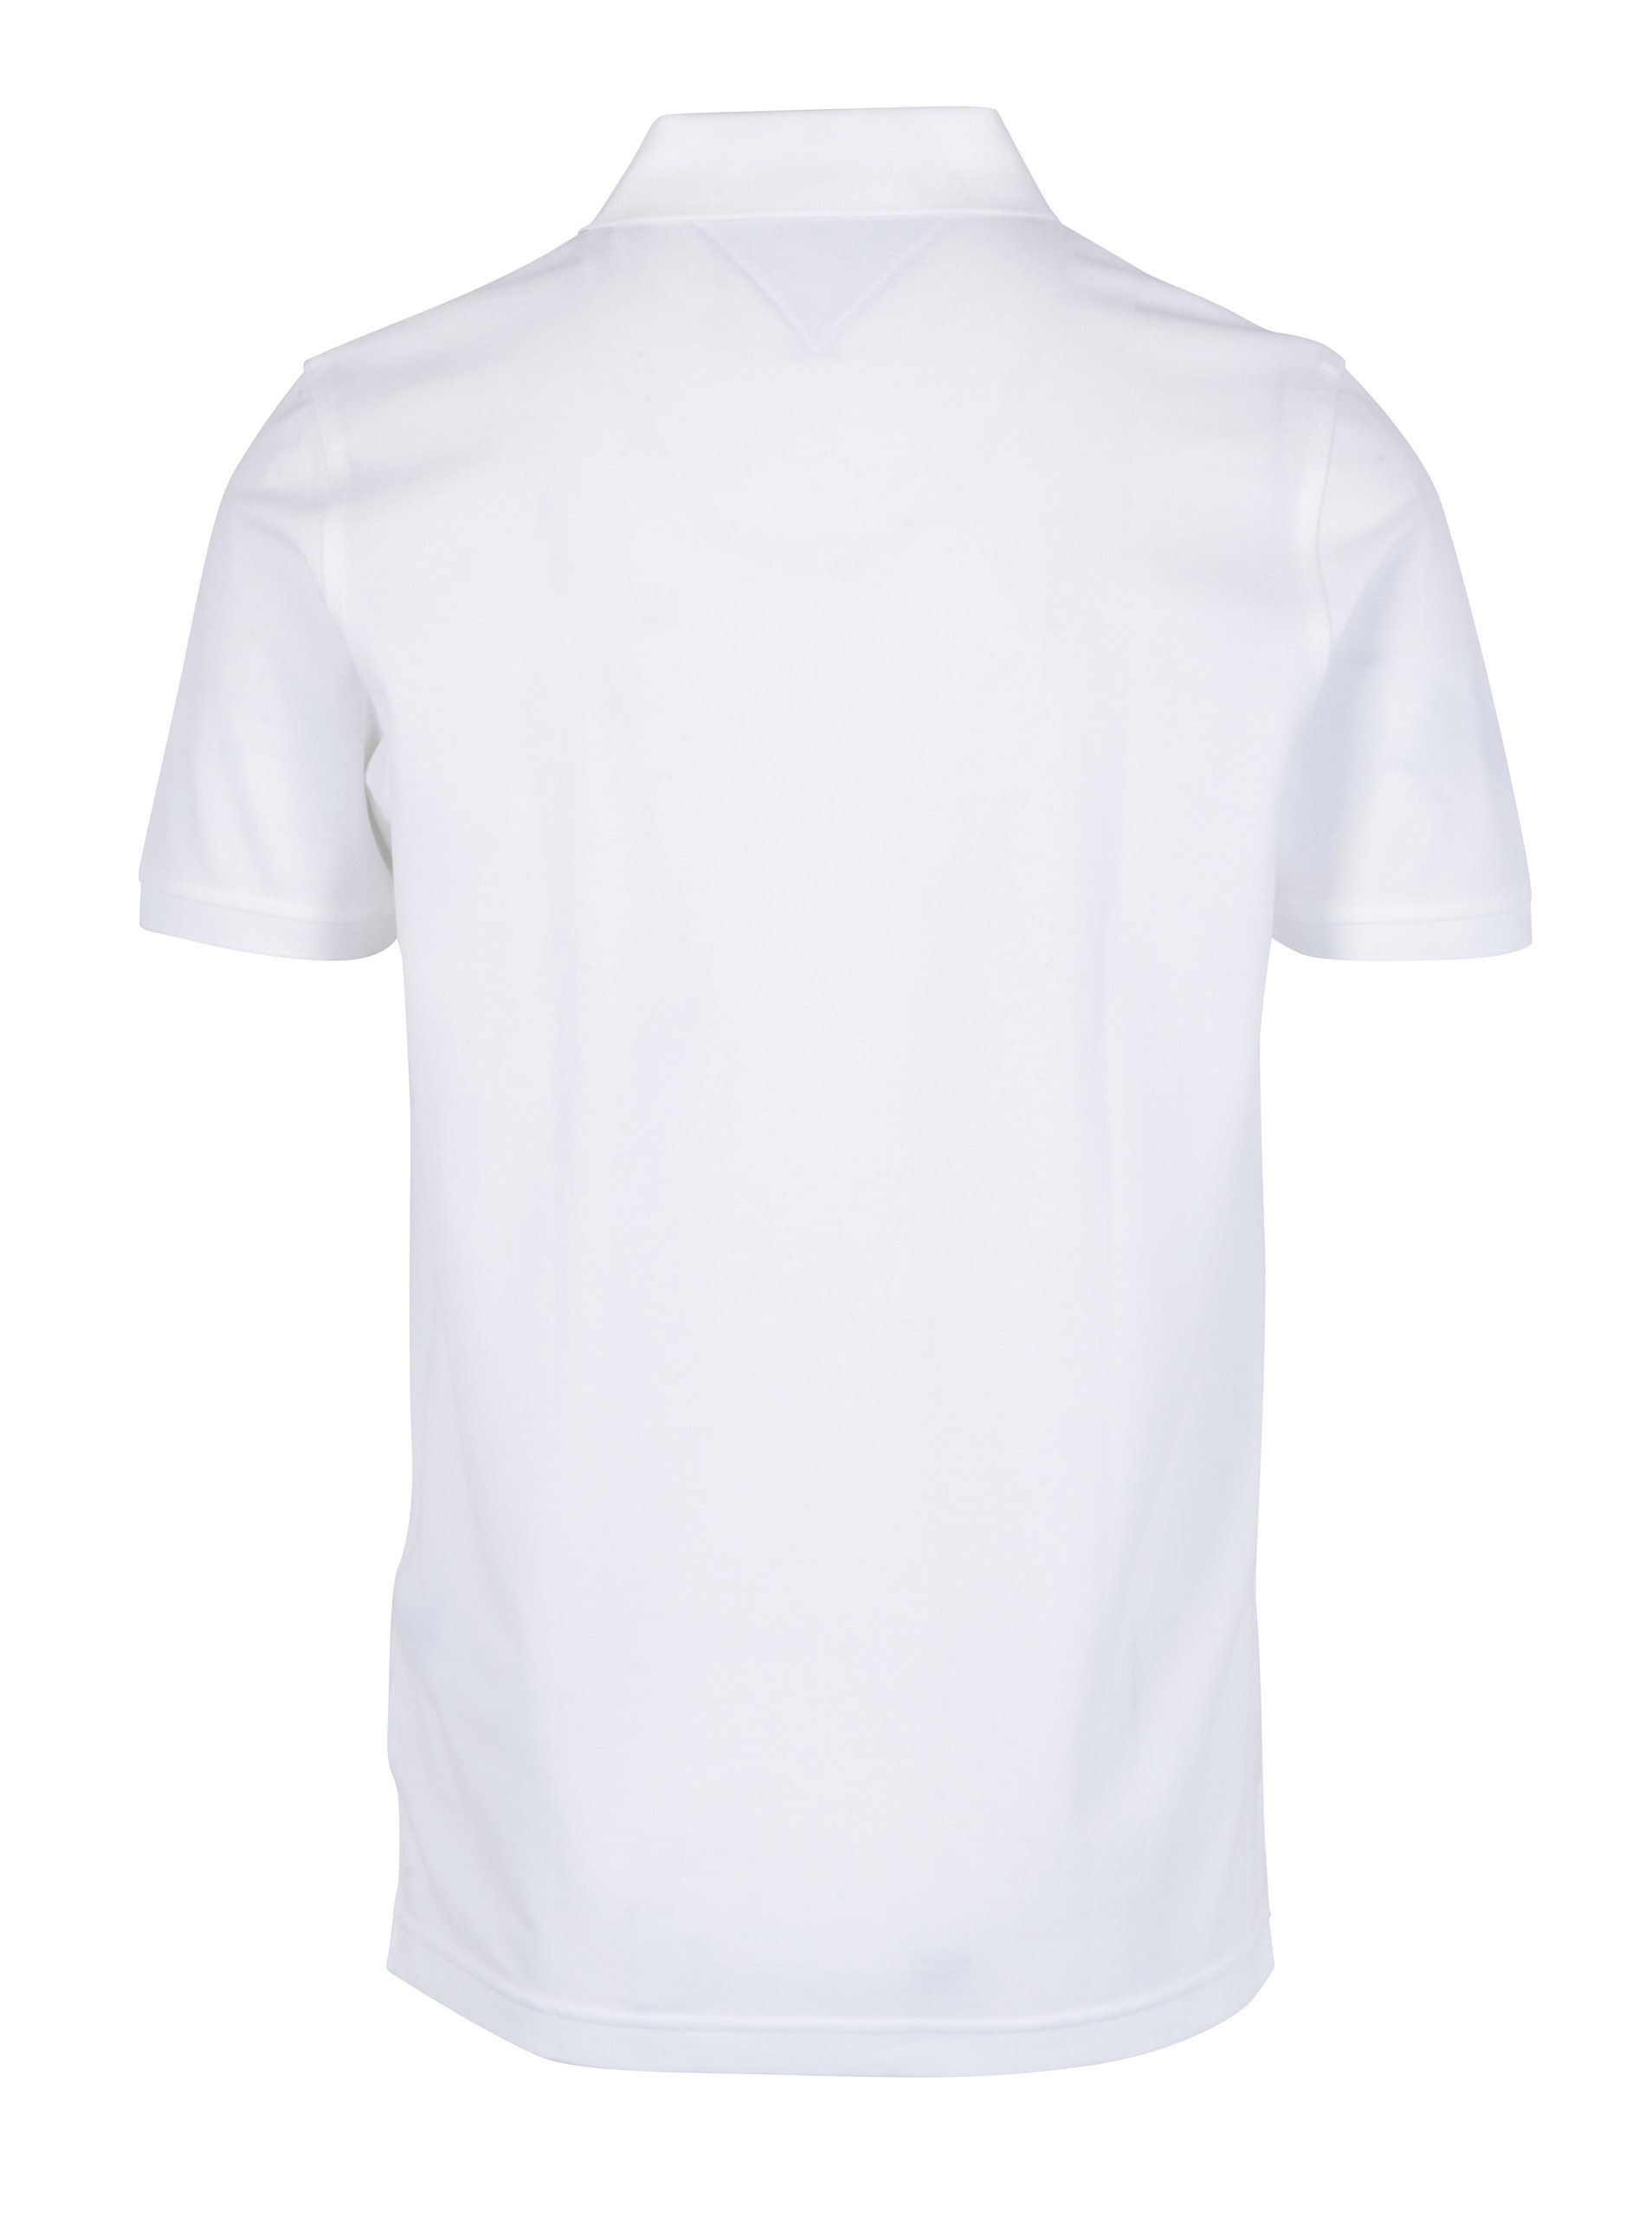 Bílé pánské polo tričko Tommy Hilfiger Luxury ... 8d3eaa4e137